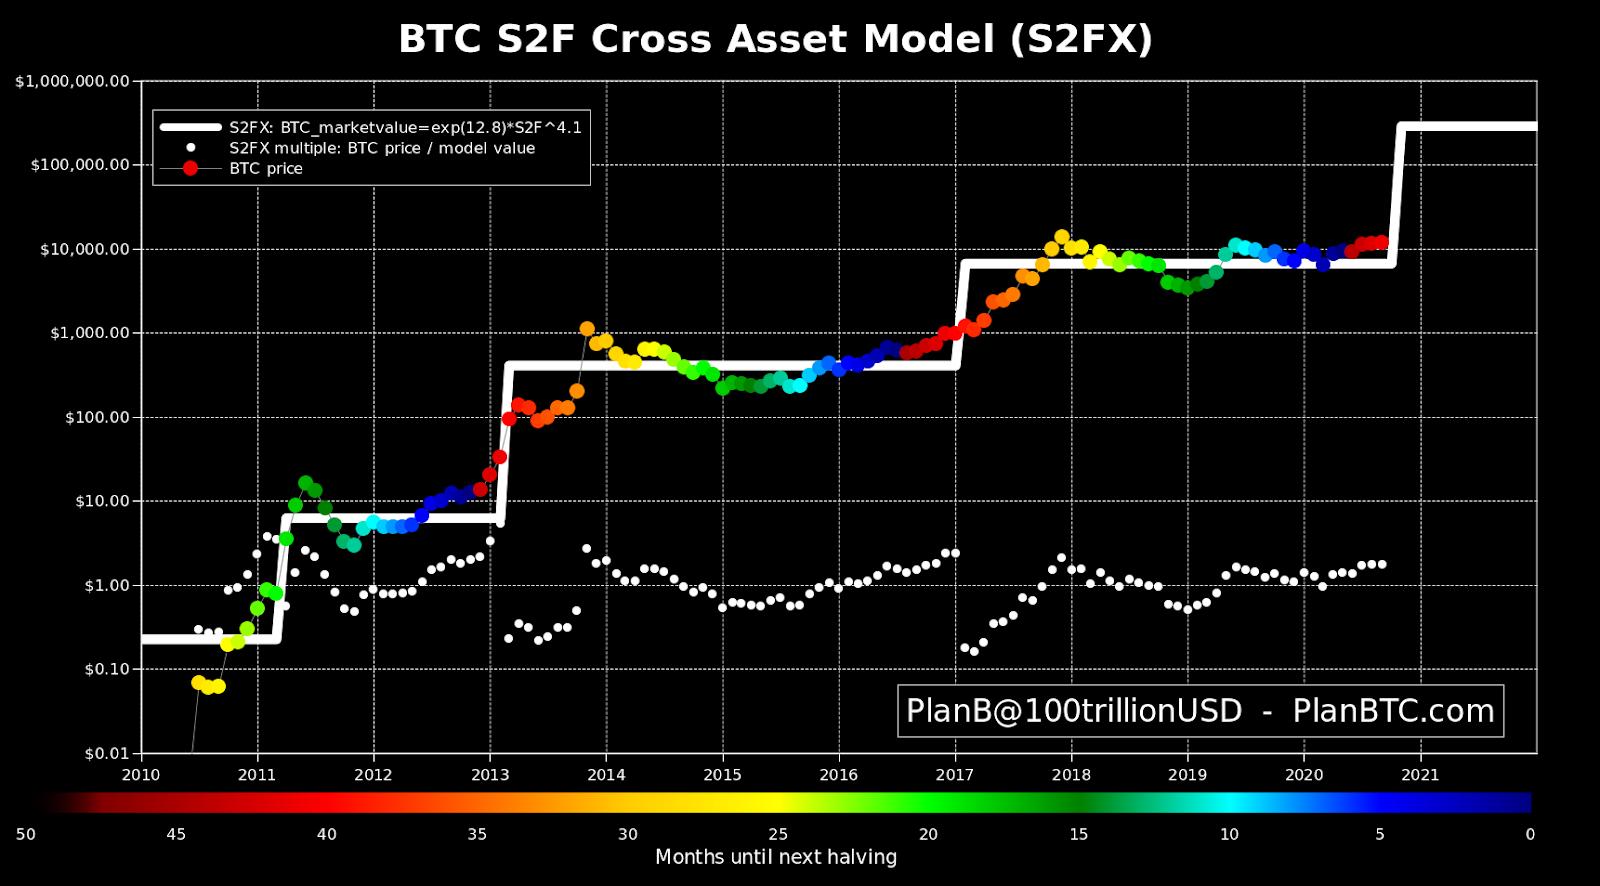 Gráfico do modelo S2F de PlanB